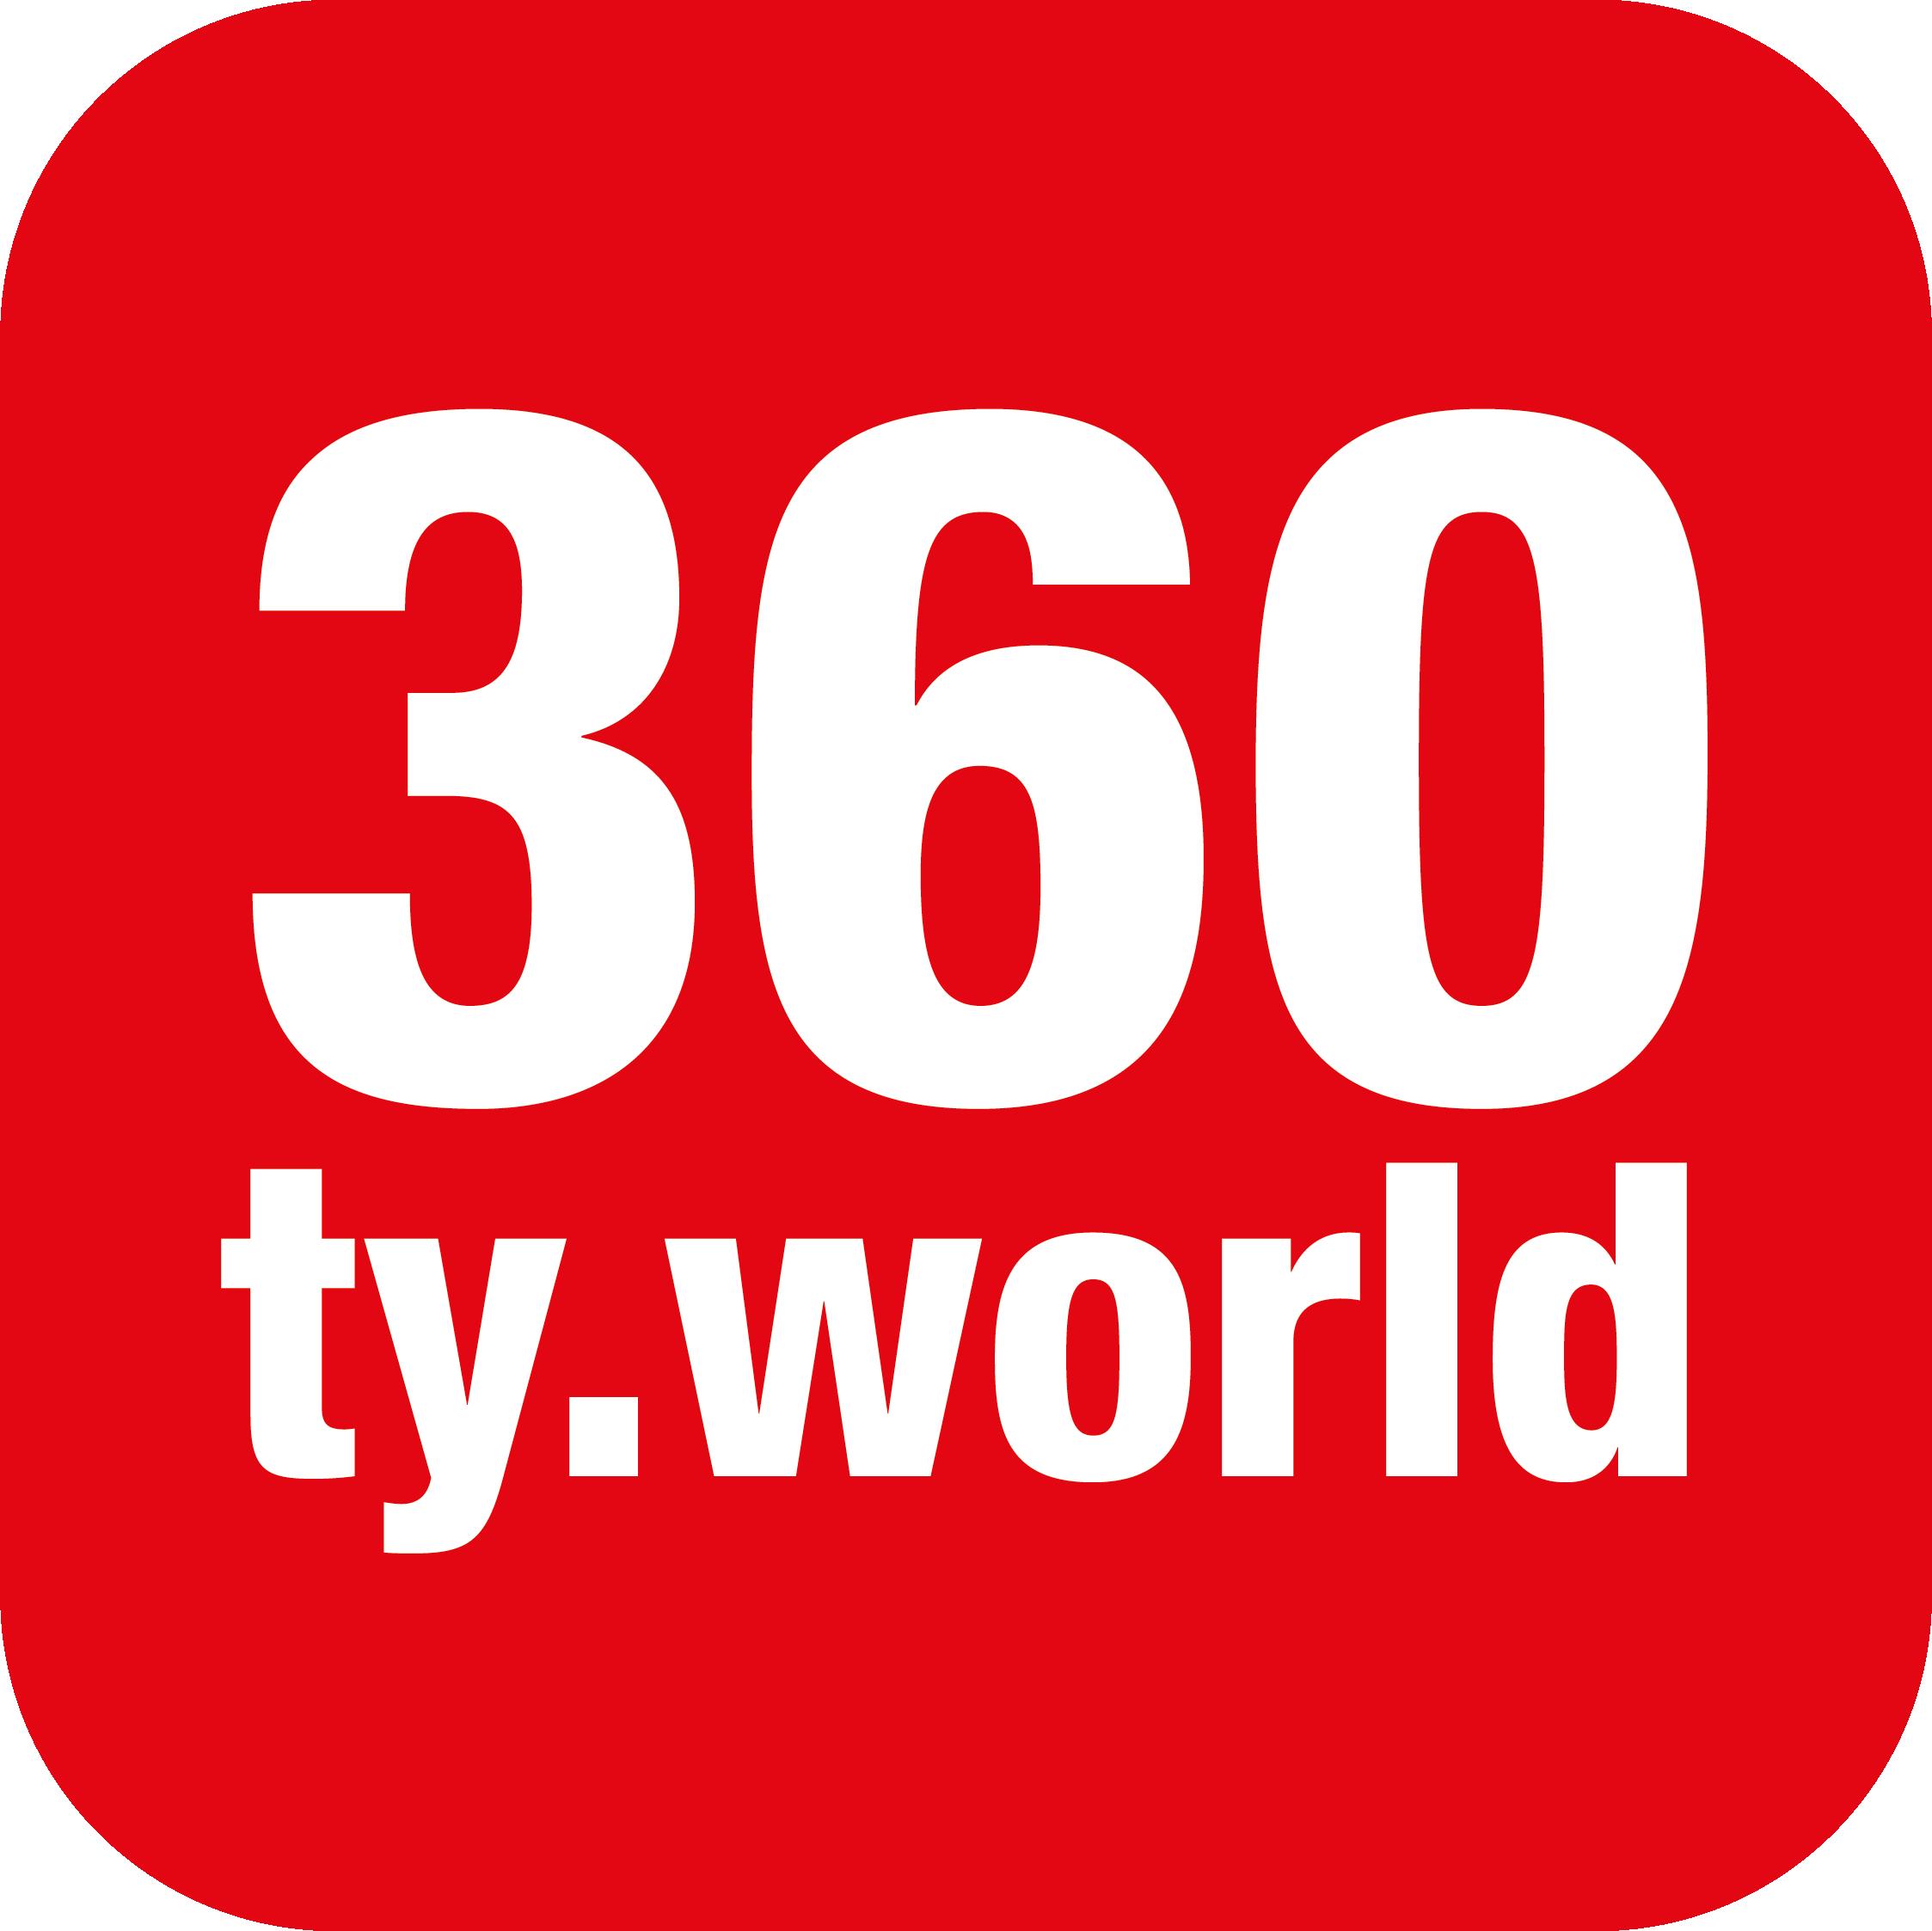 360ty